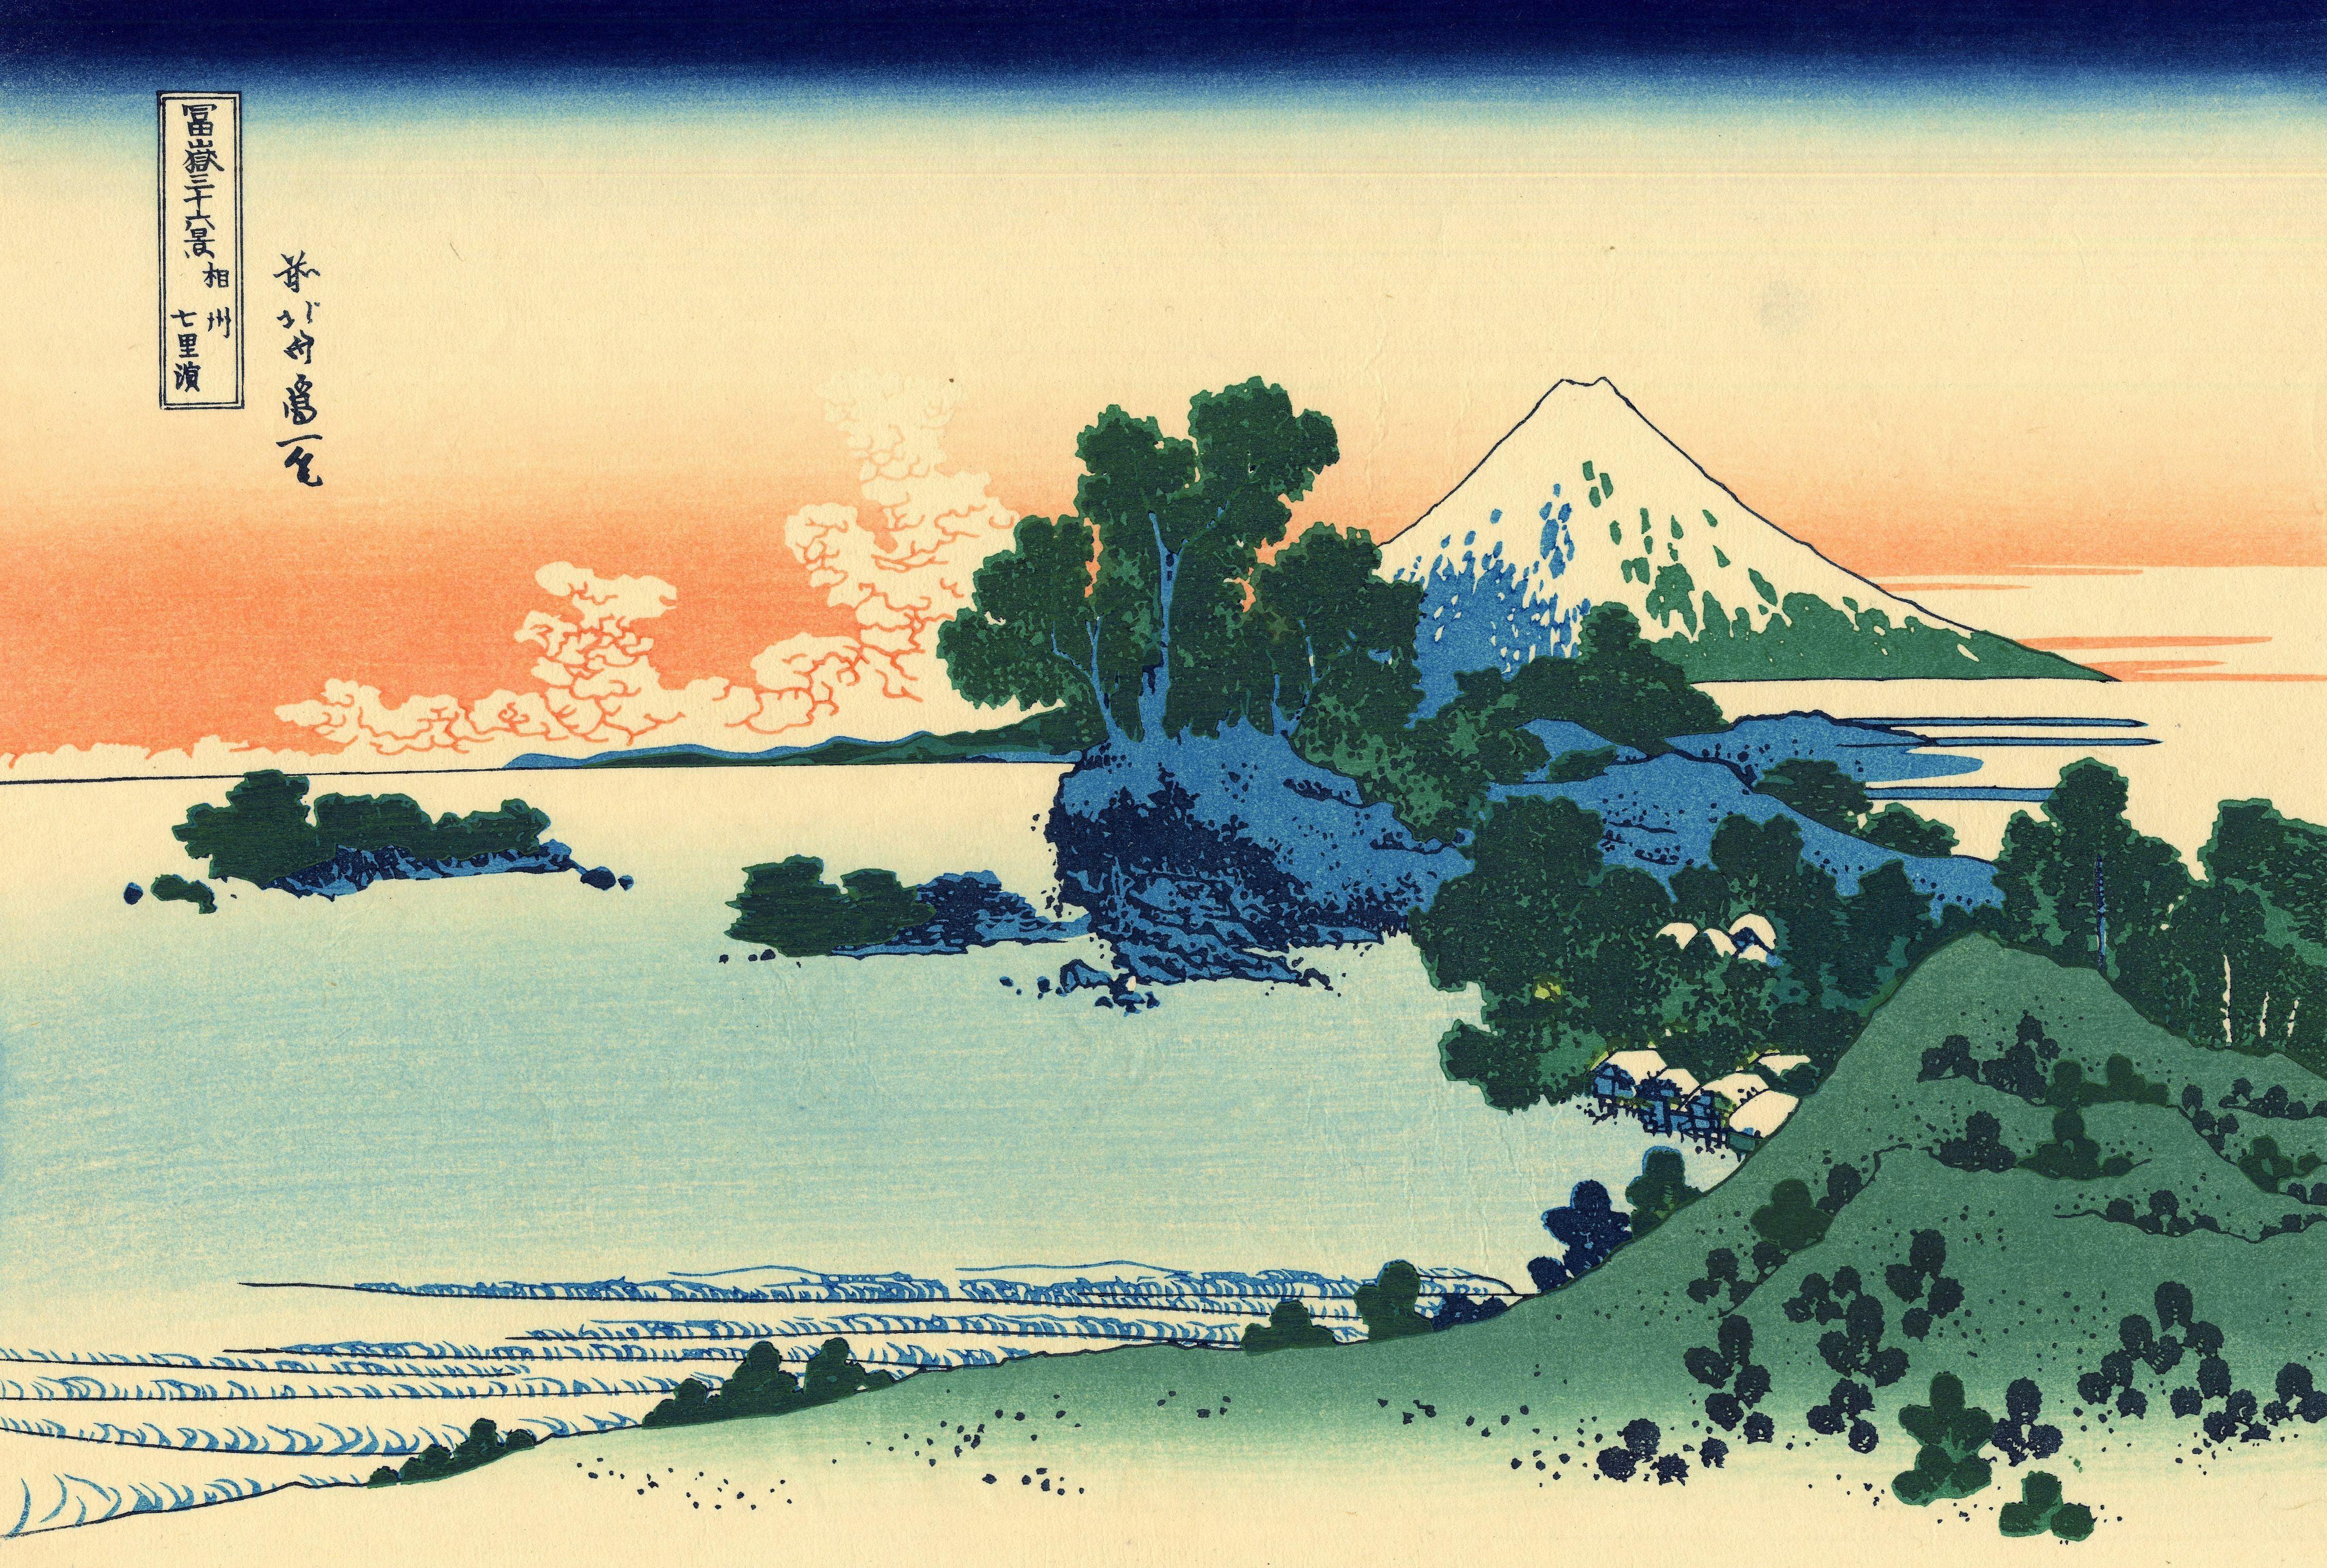 Katsushika Hokusai Wallpaper People HD WallpaperHi Res People 4517x3044